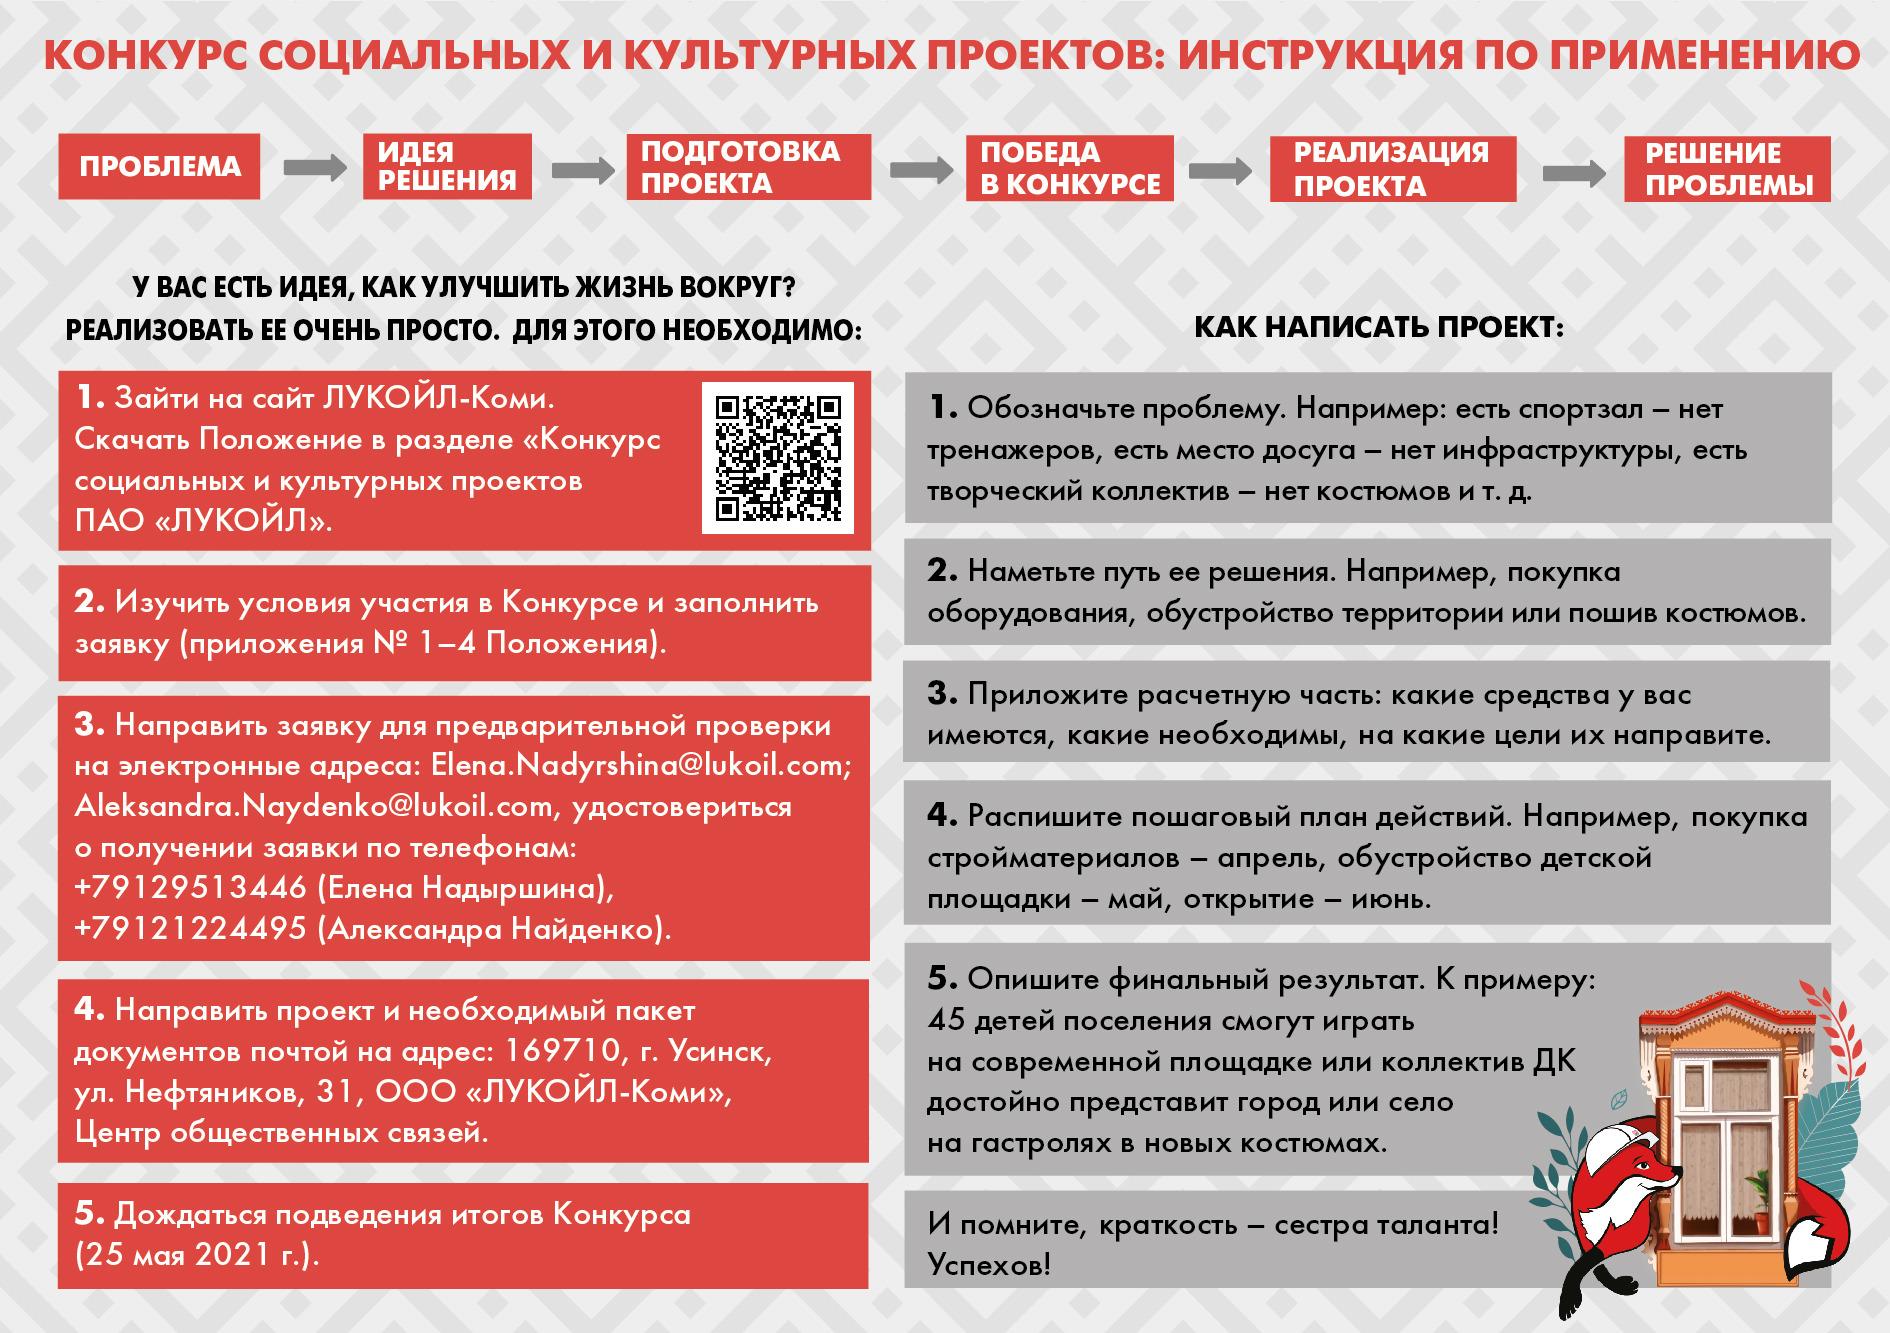 05-Infografika-KSKP_Montaghnaya-oblast-1_Montaghnaya-oblast-1.jpg